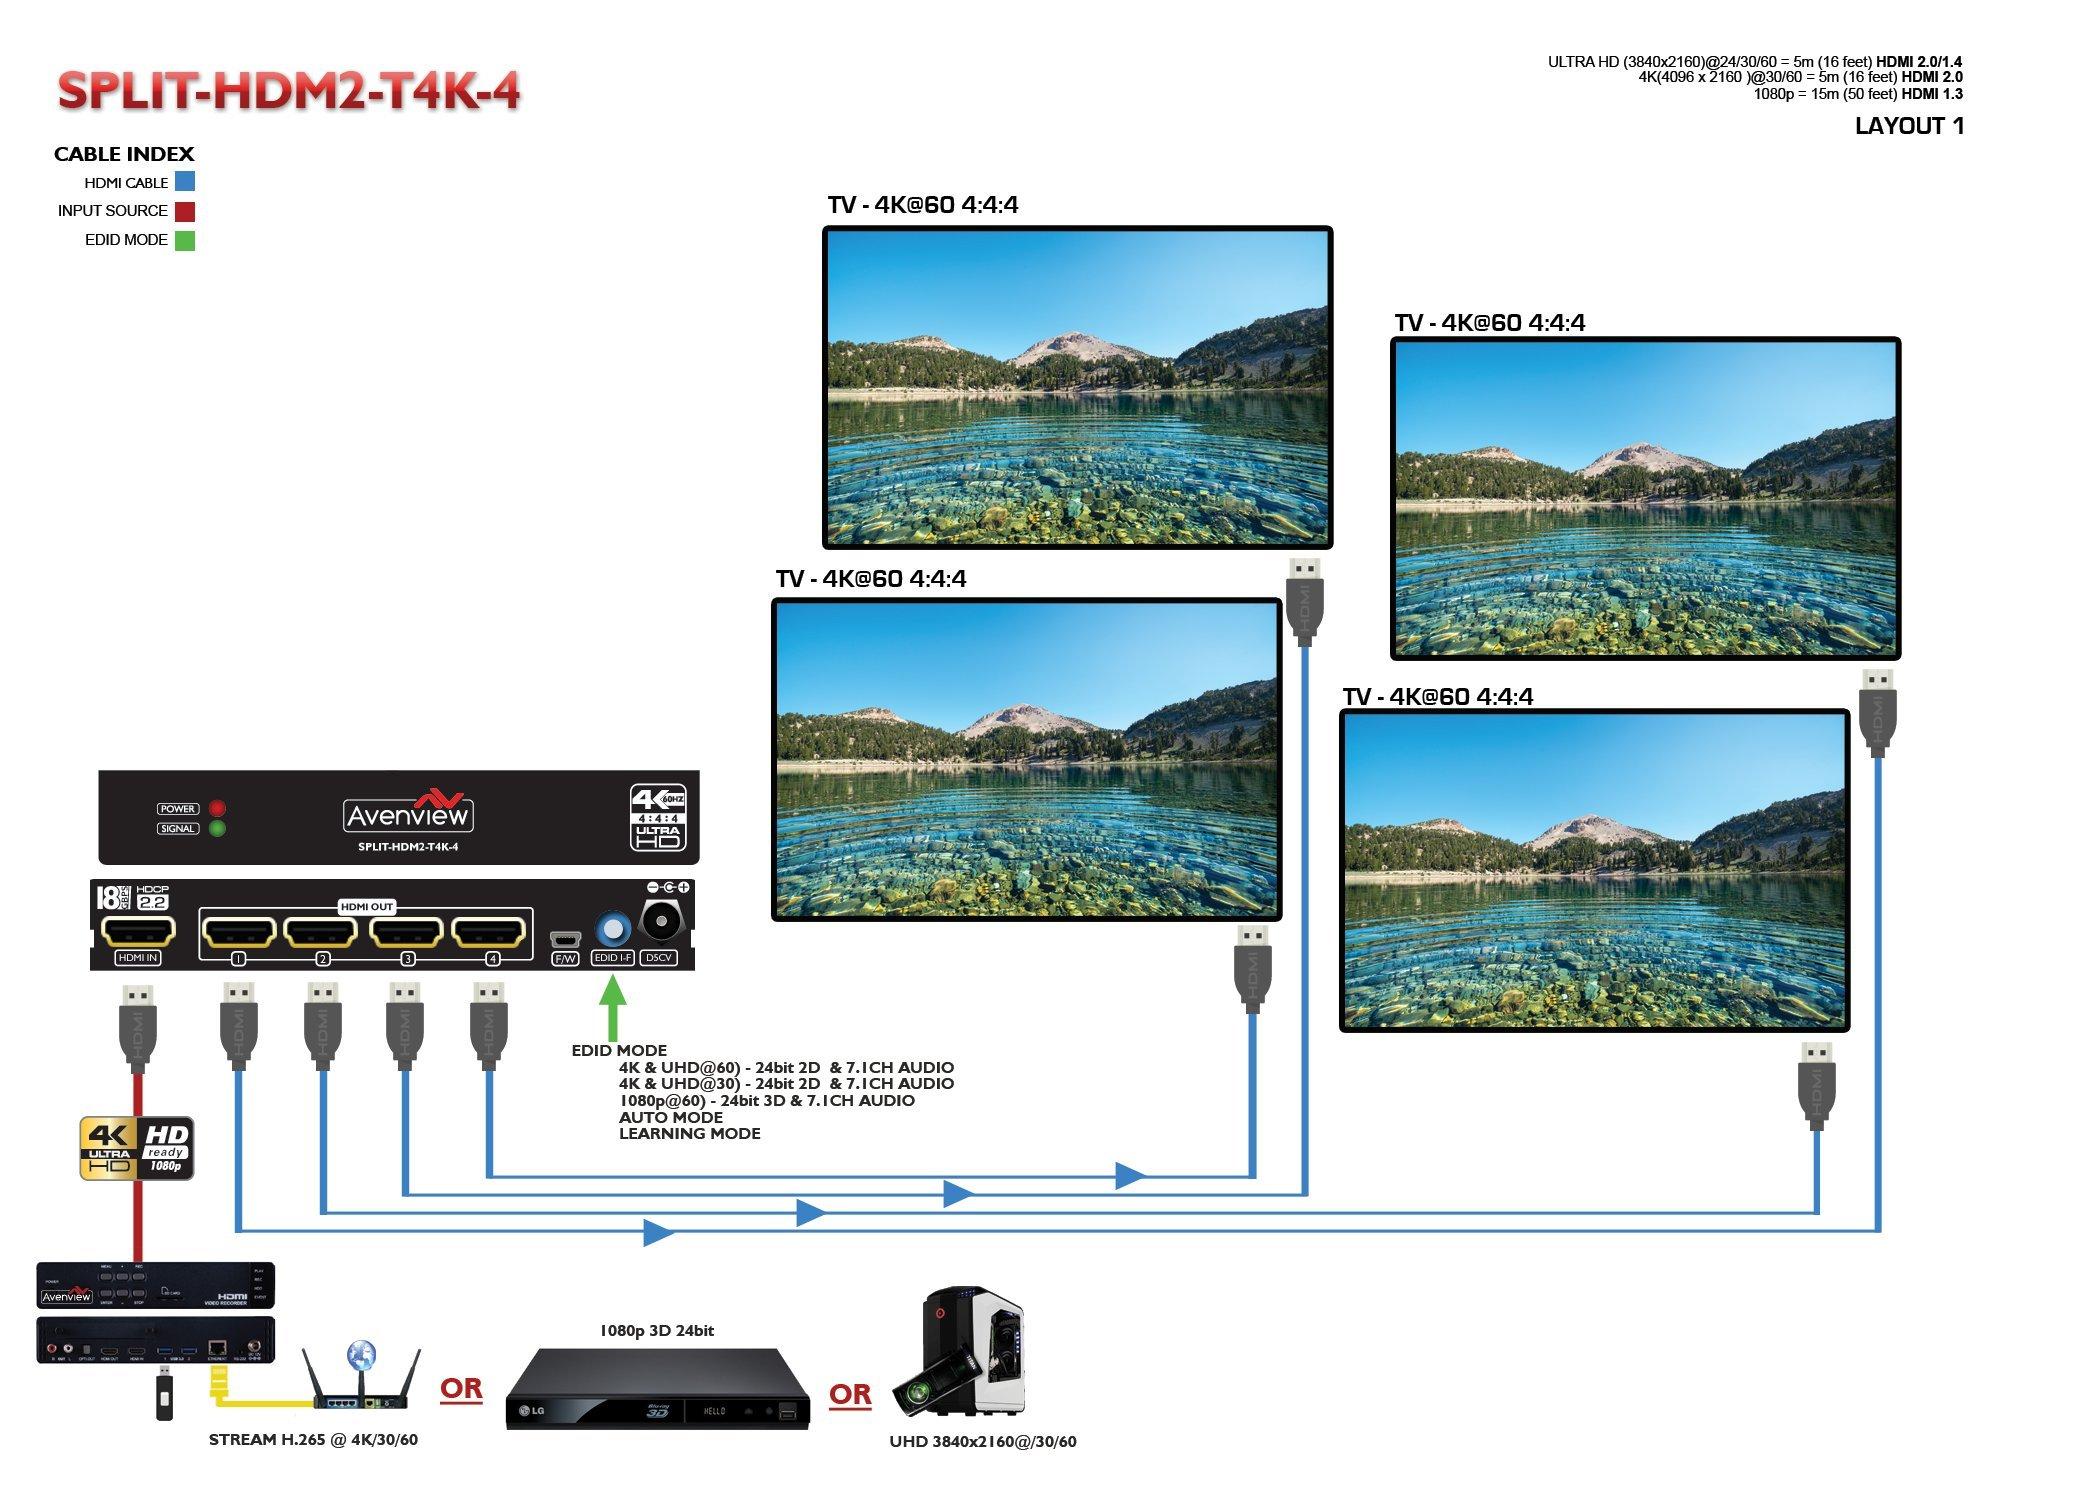 Avenview SPLIT-HDM2-T4K-4 1x4 HDMI TRUE 4K@60 18Gbps (600MHz) SPLITTER WITH EDID & HD SUPPORT